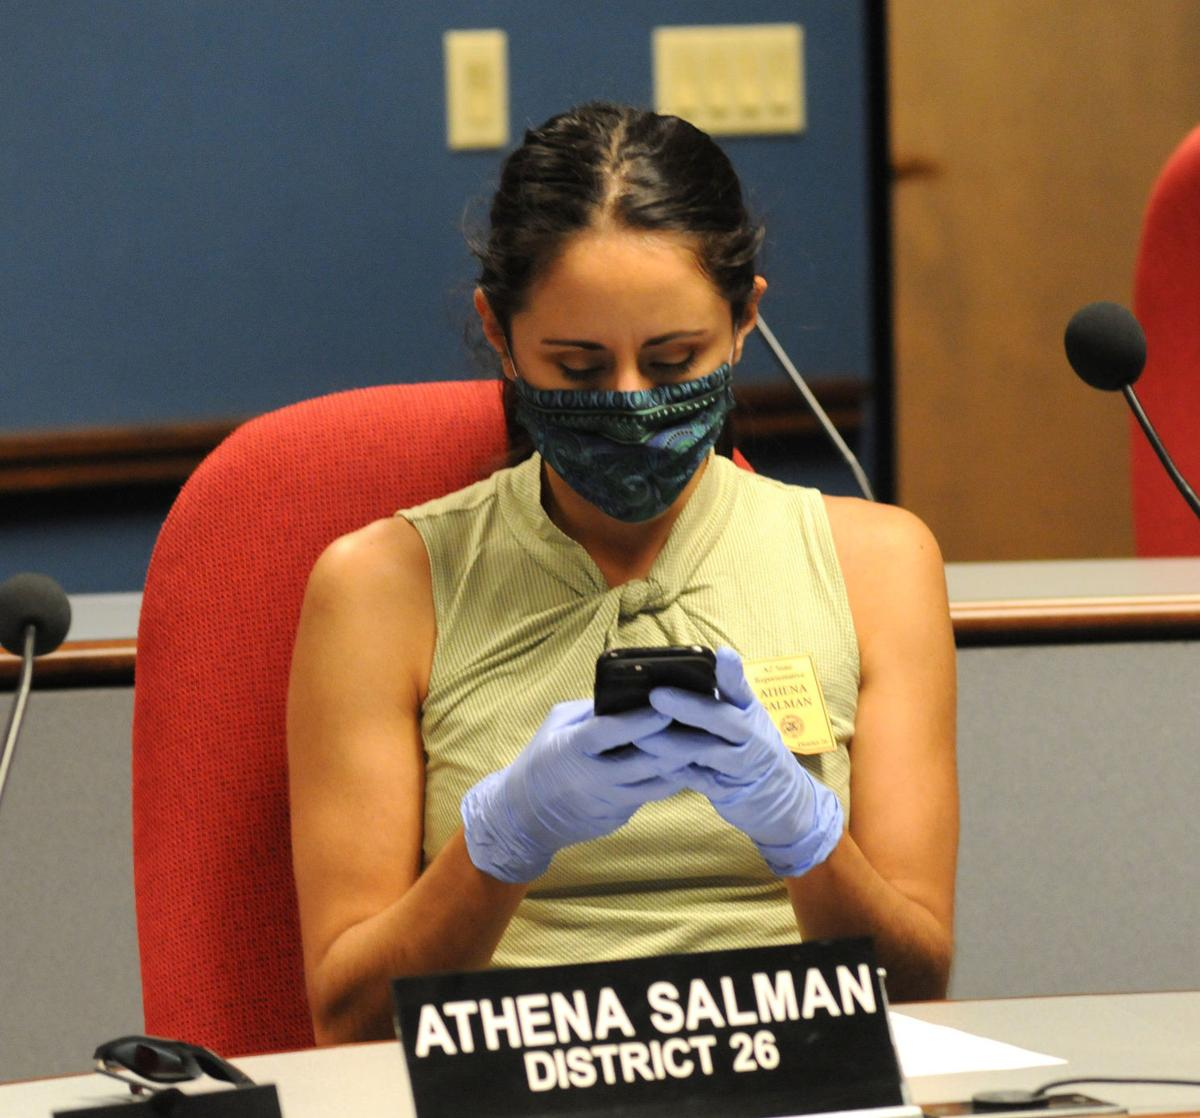 Rep. Athena Salman